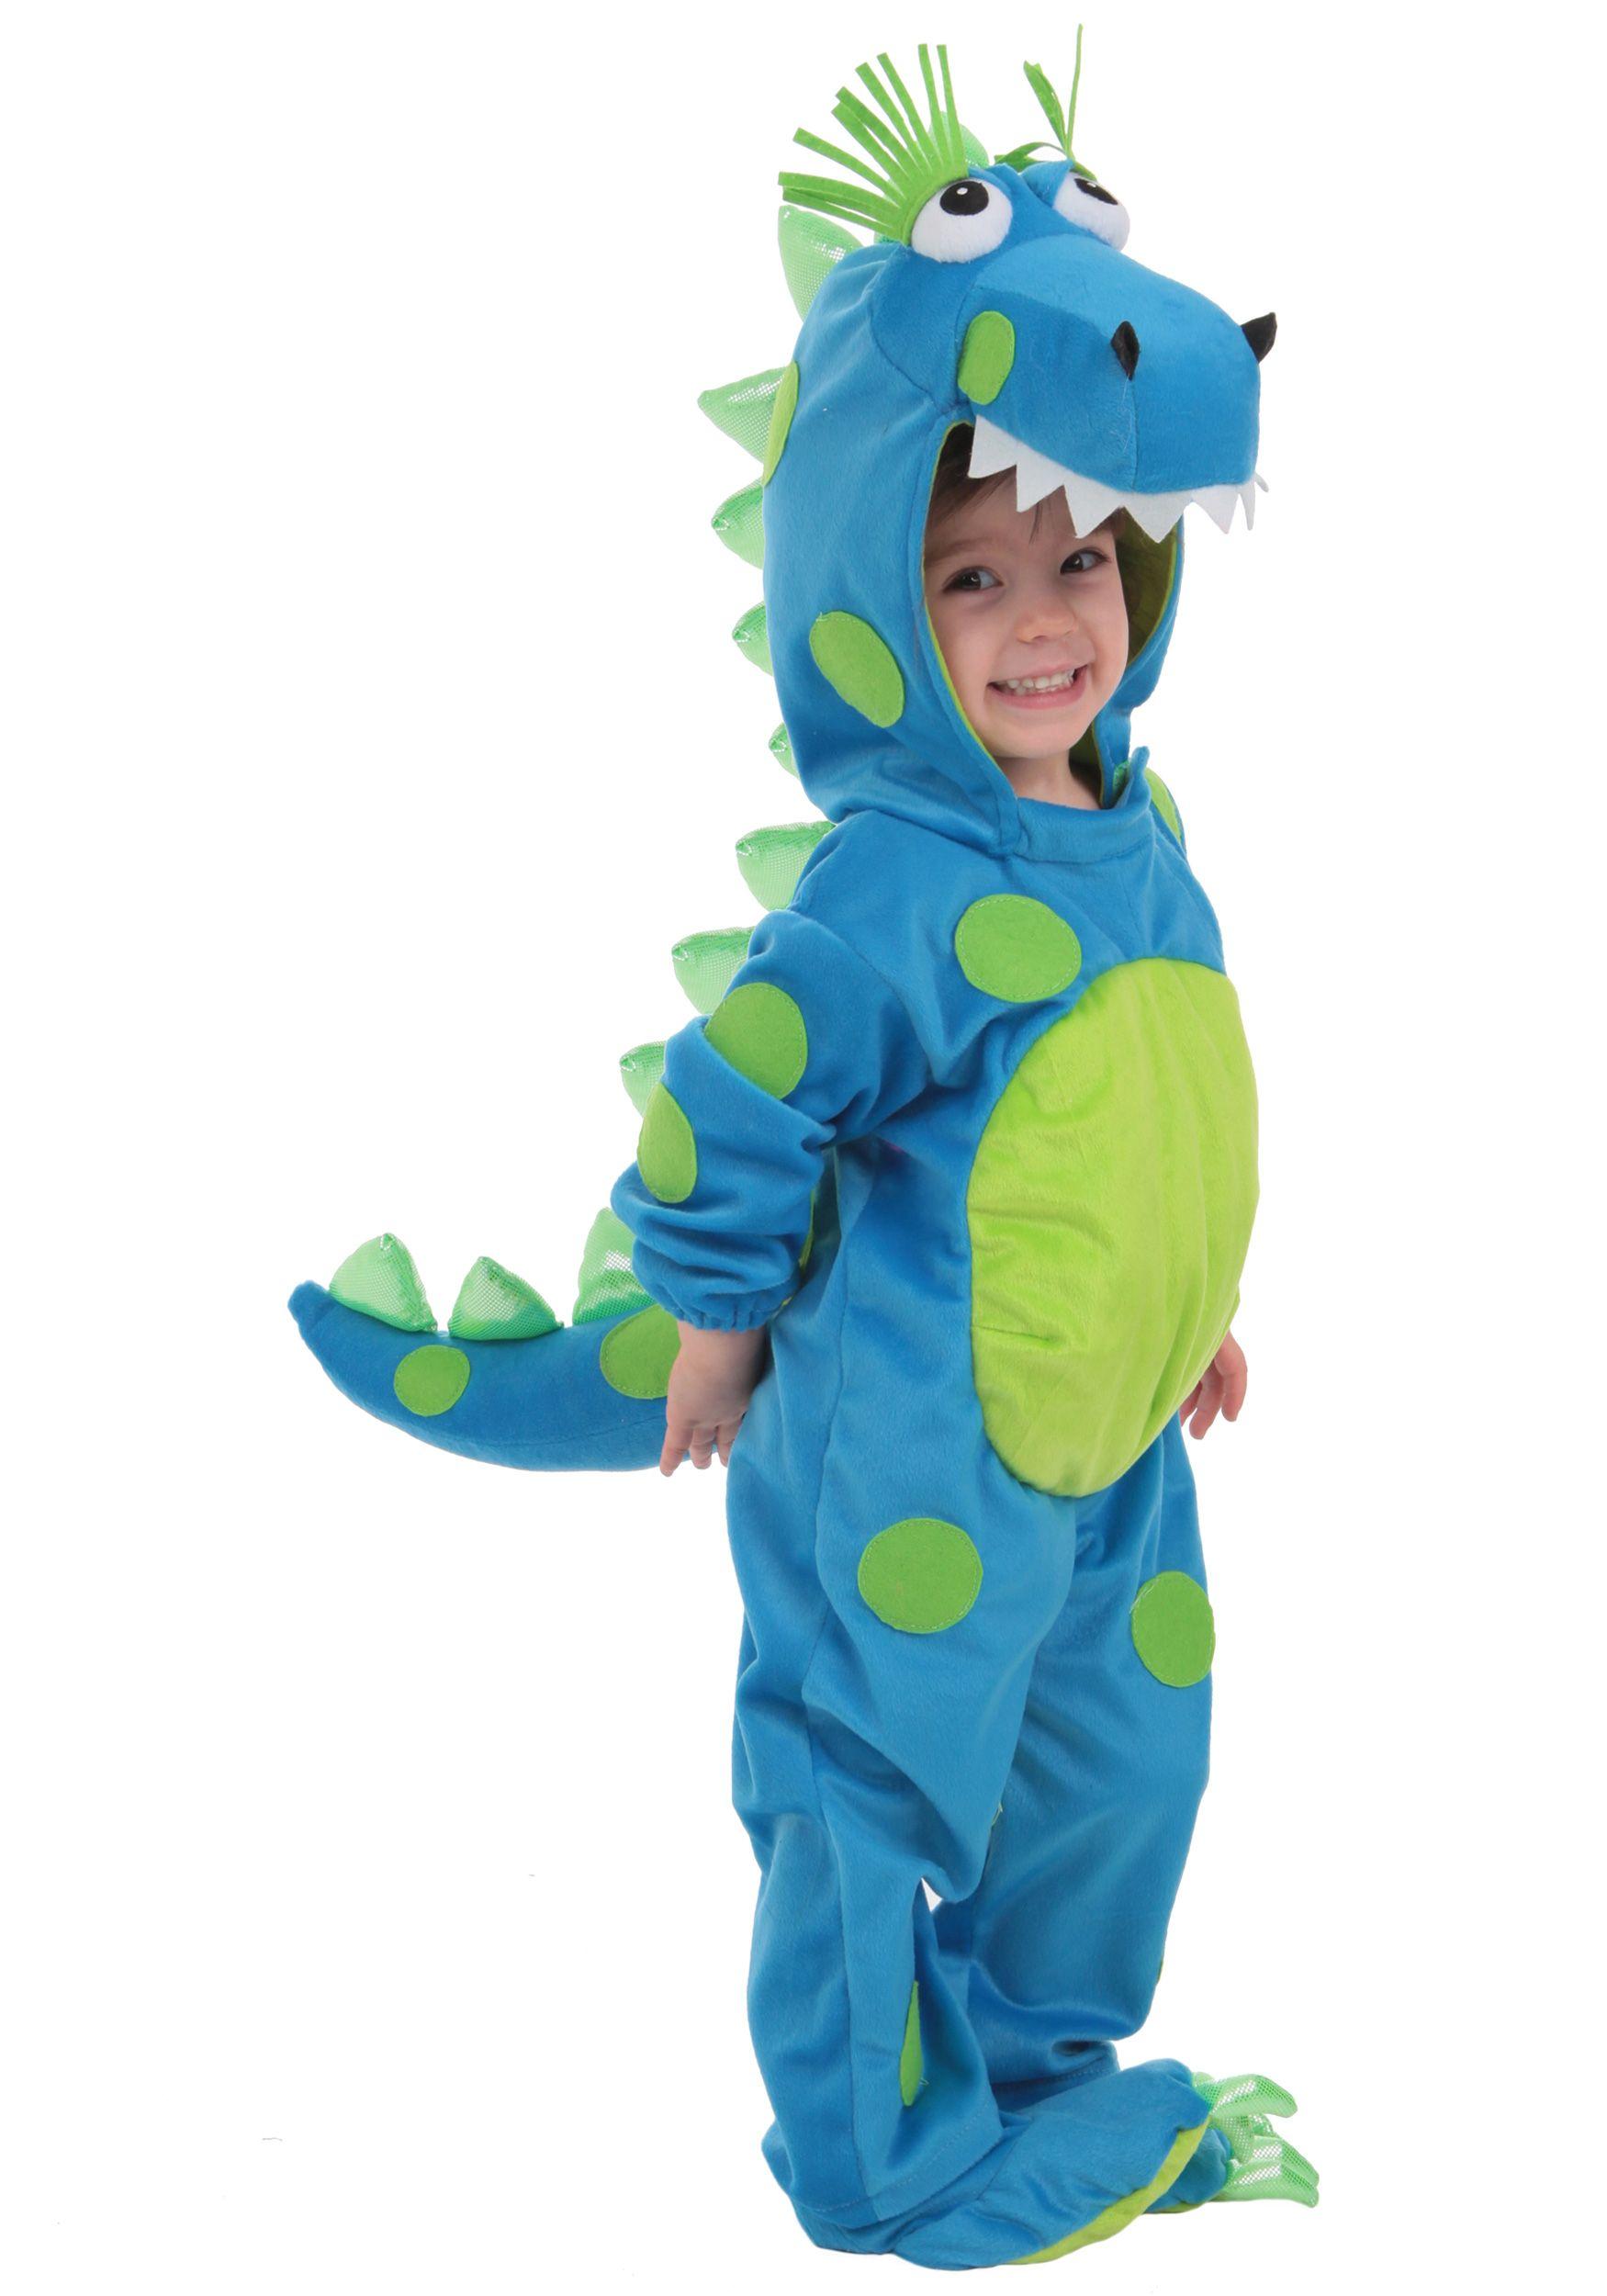 pinjessica adams on 15 kid stuff | pinterest | dragon costume